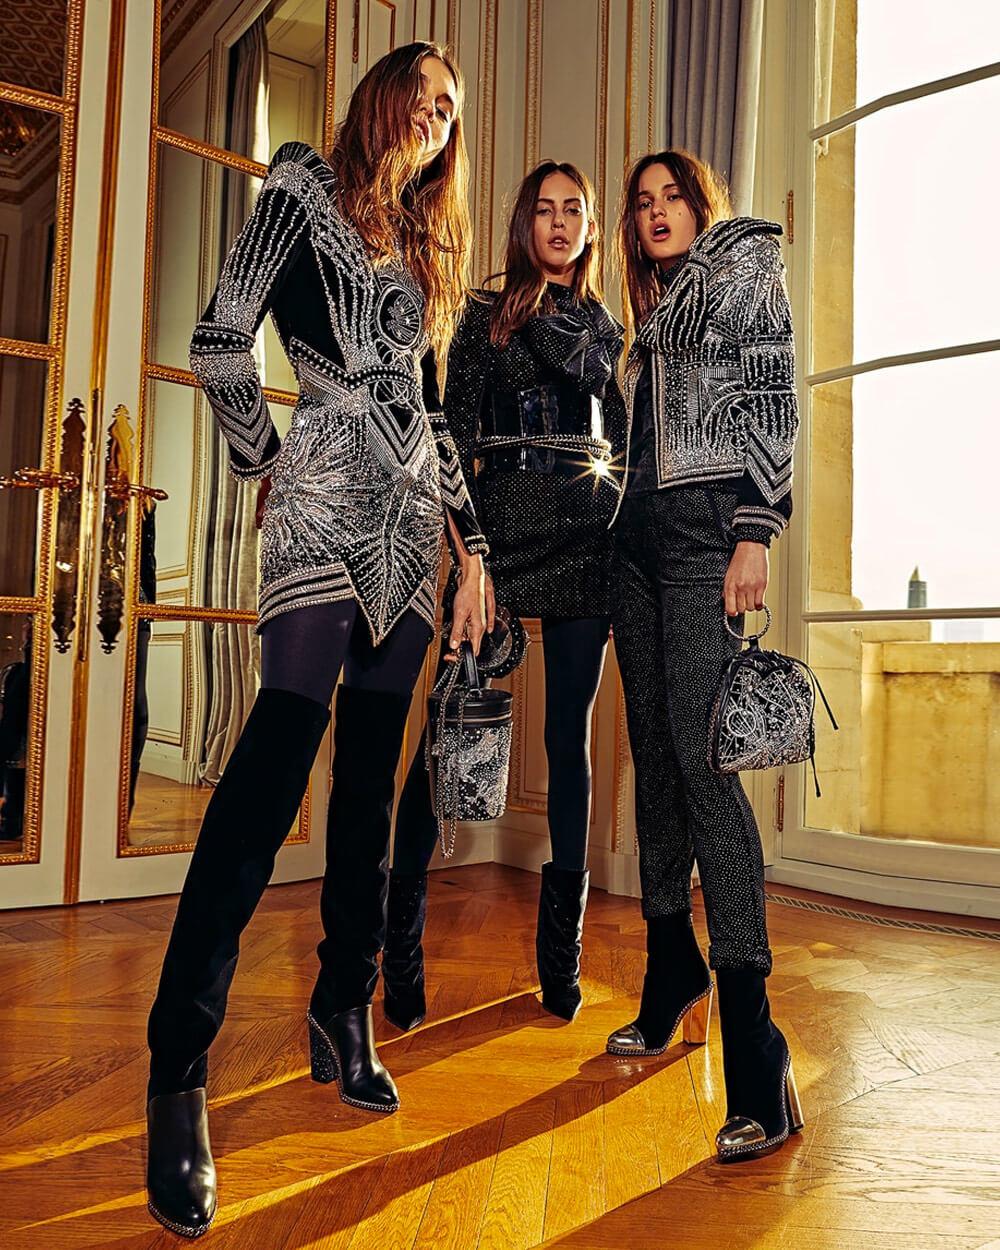 Balmain - top fashion brands of 2021